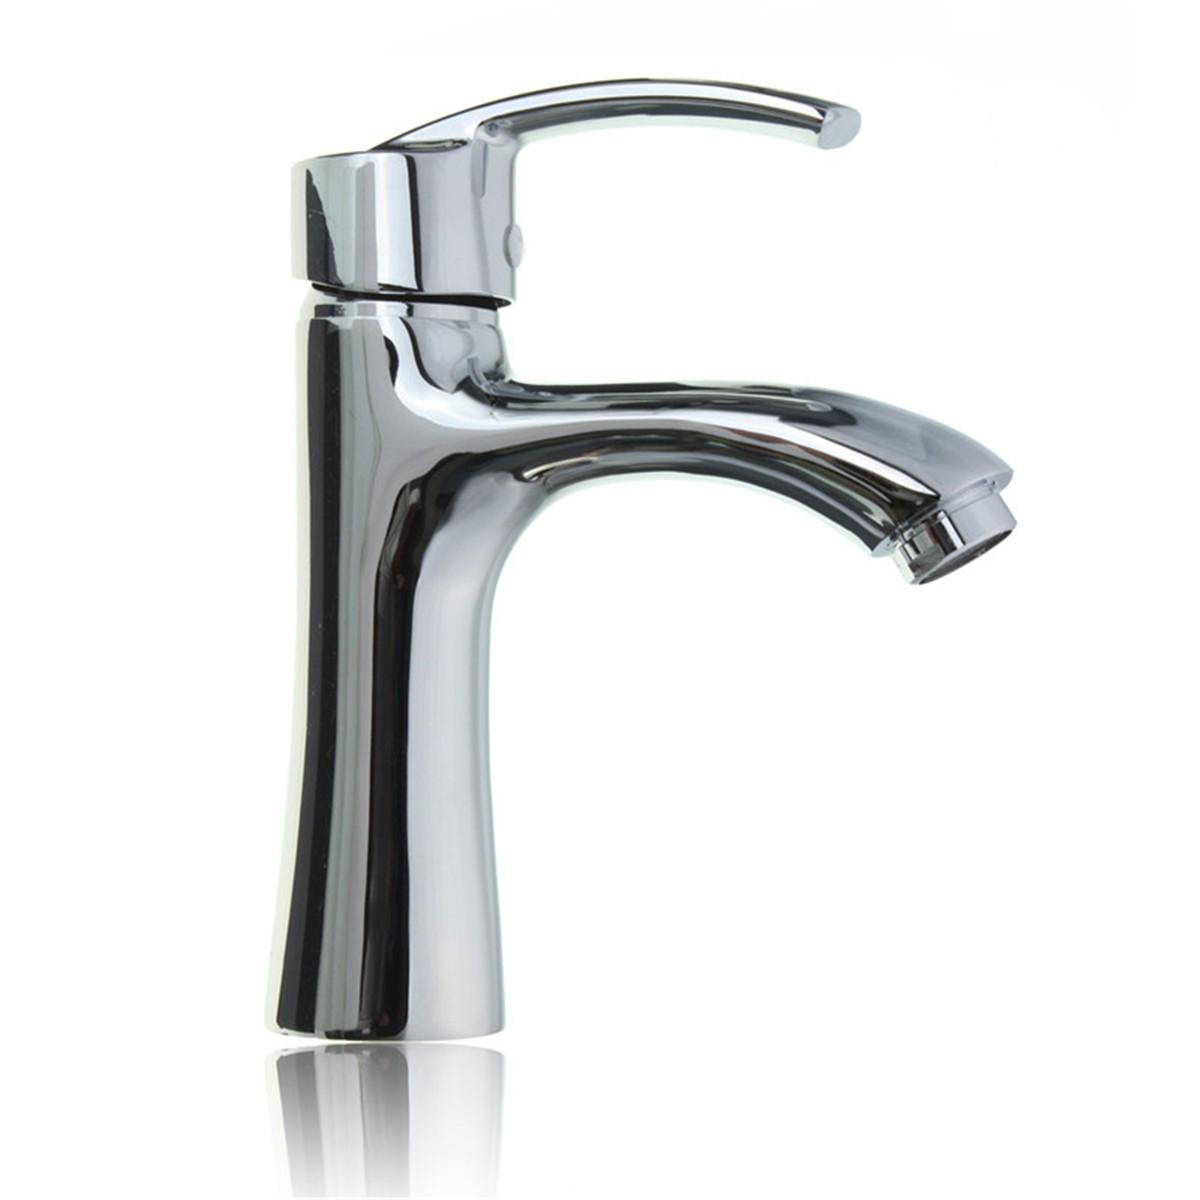 New Single Hole Single Handle Bath Room Bathroom Faucet Hot Cold Faucet Intl Lazada Singapore